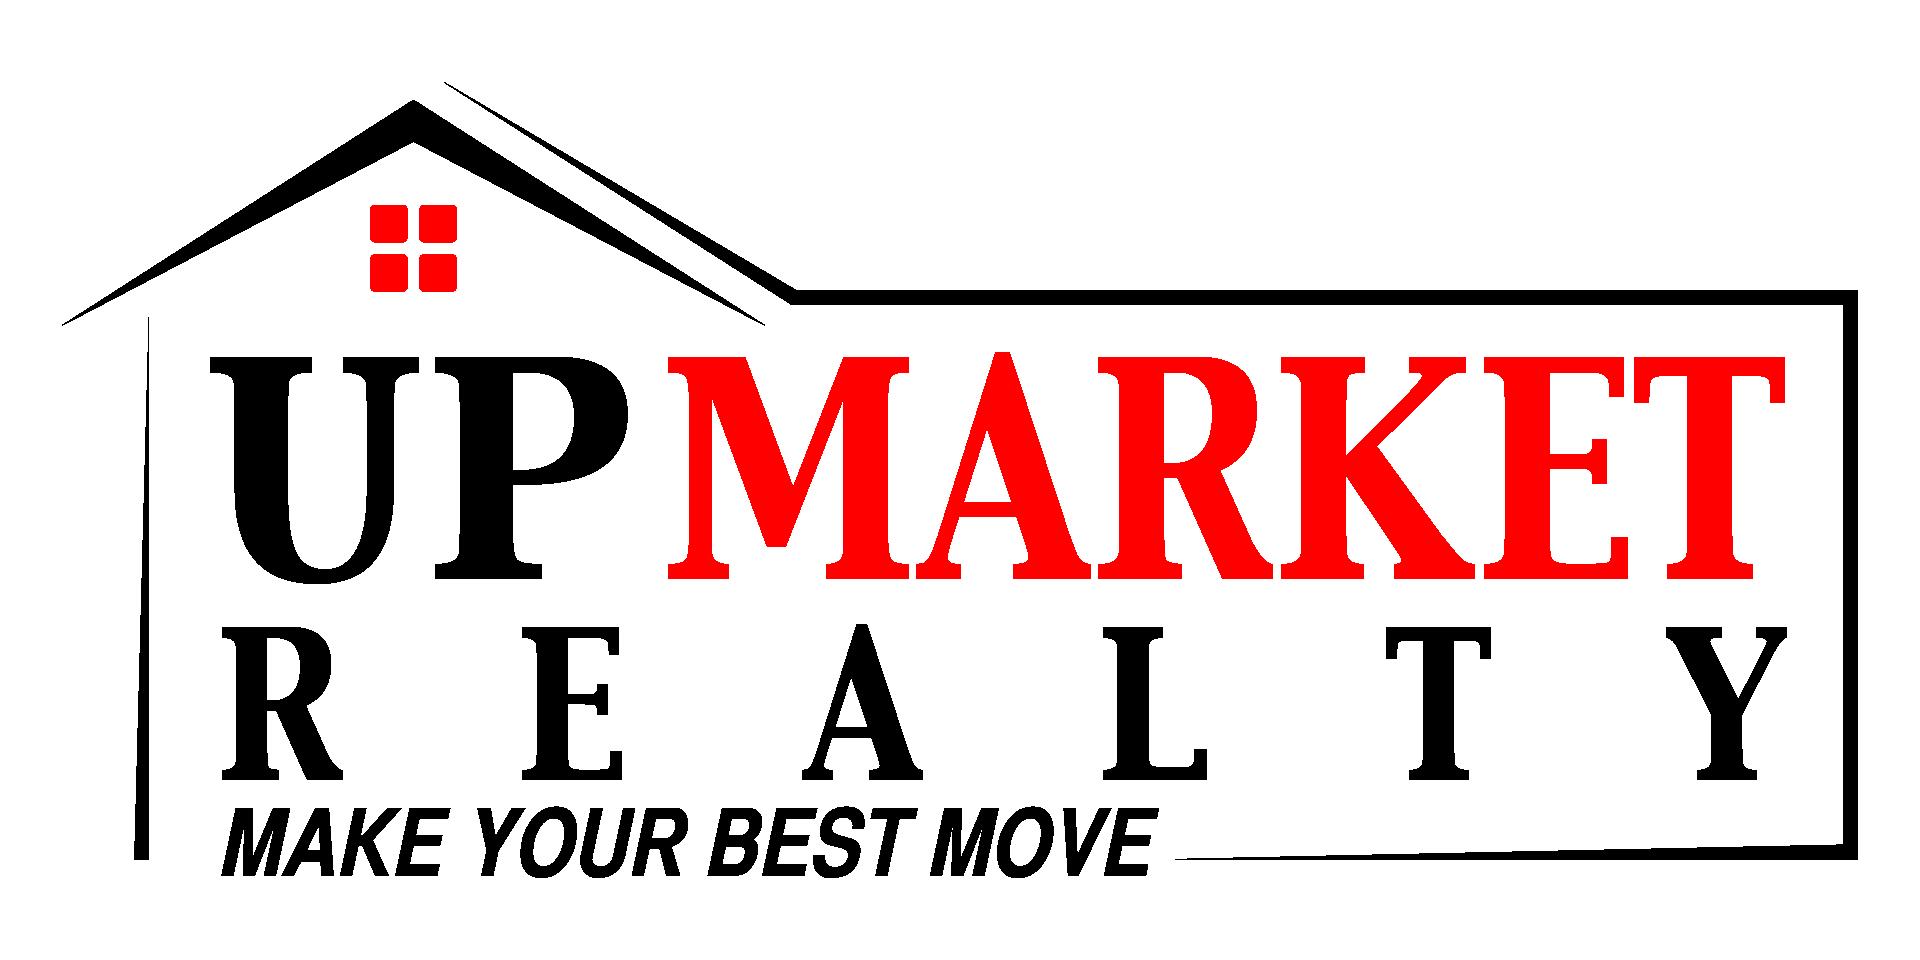 UpMarket Realty